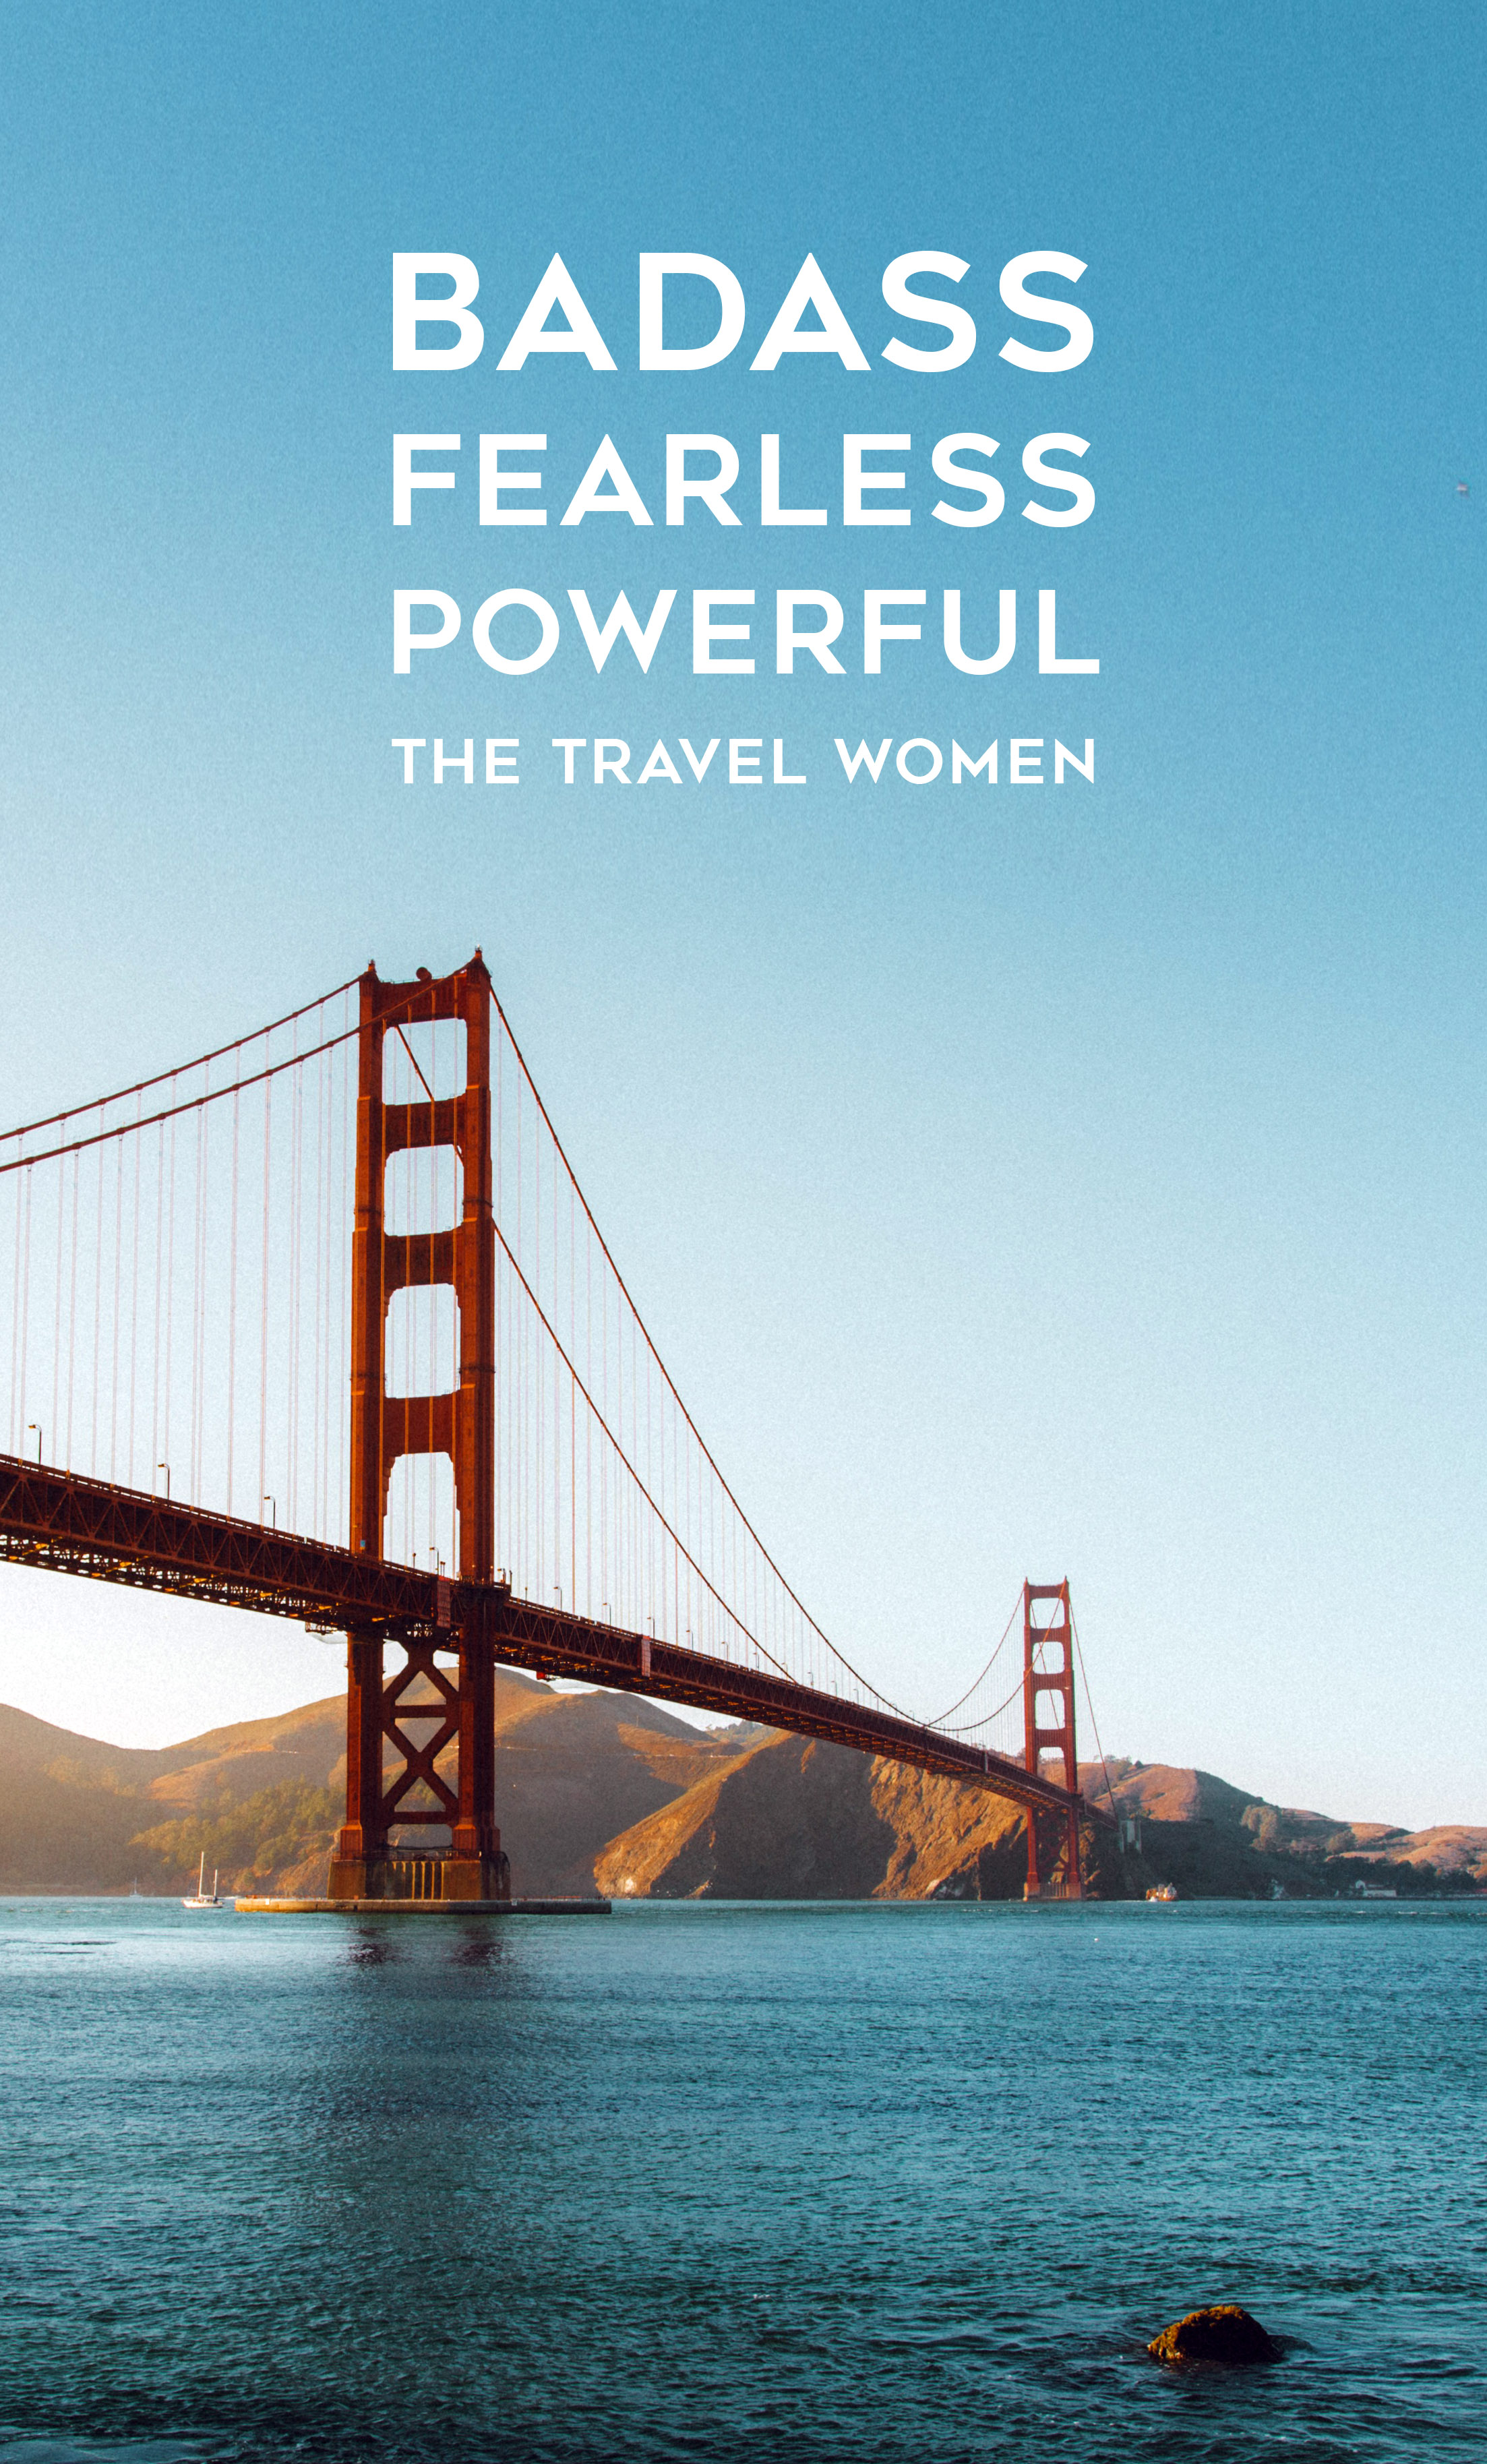 badass fearless powerful Shar Interview The Travel Women on San Francisco Golden Gate bridge photo